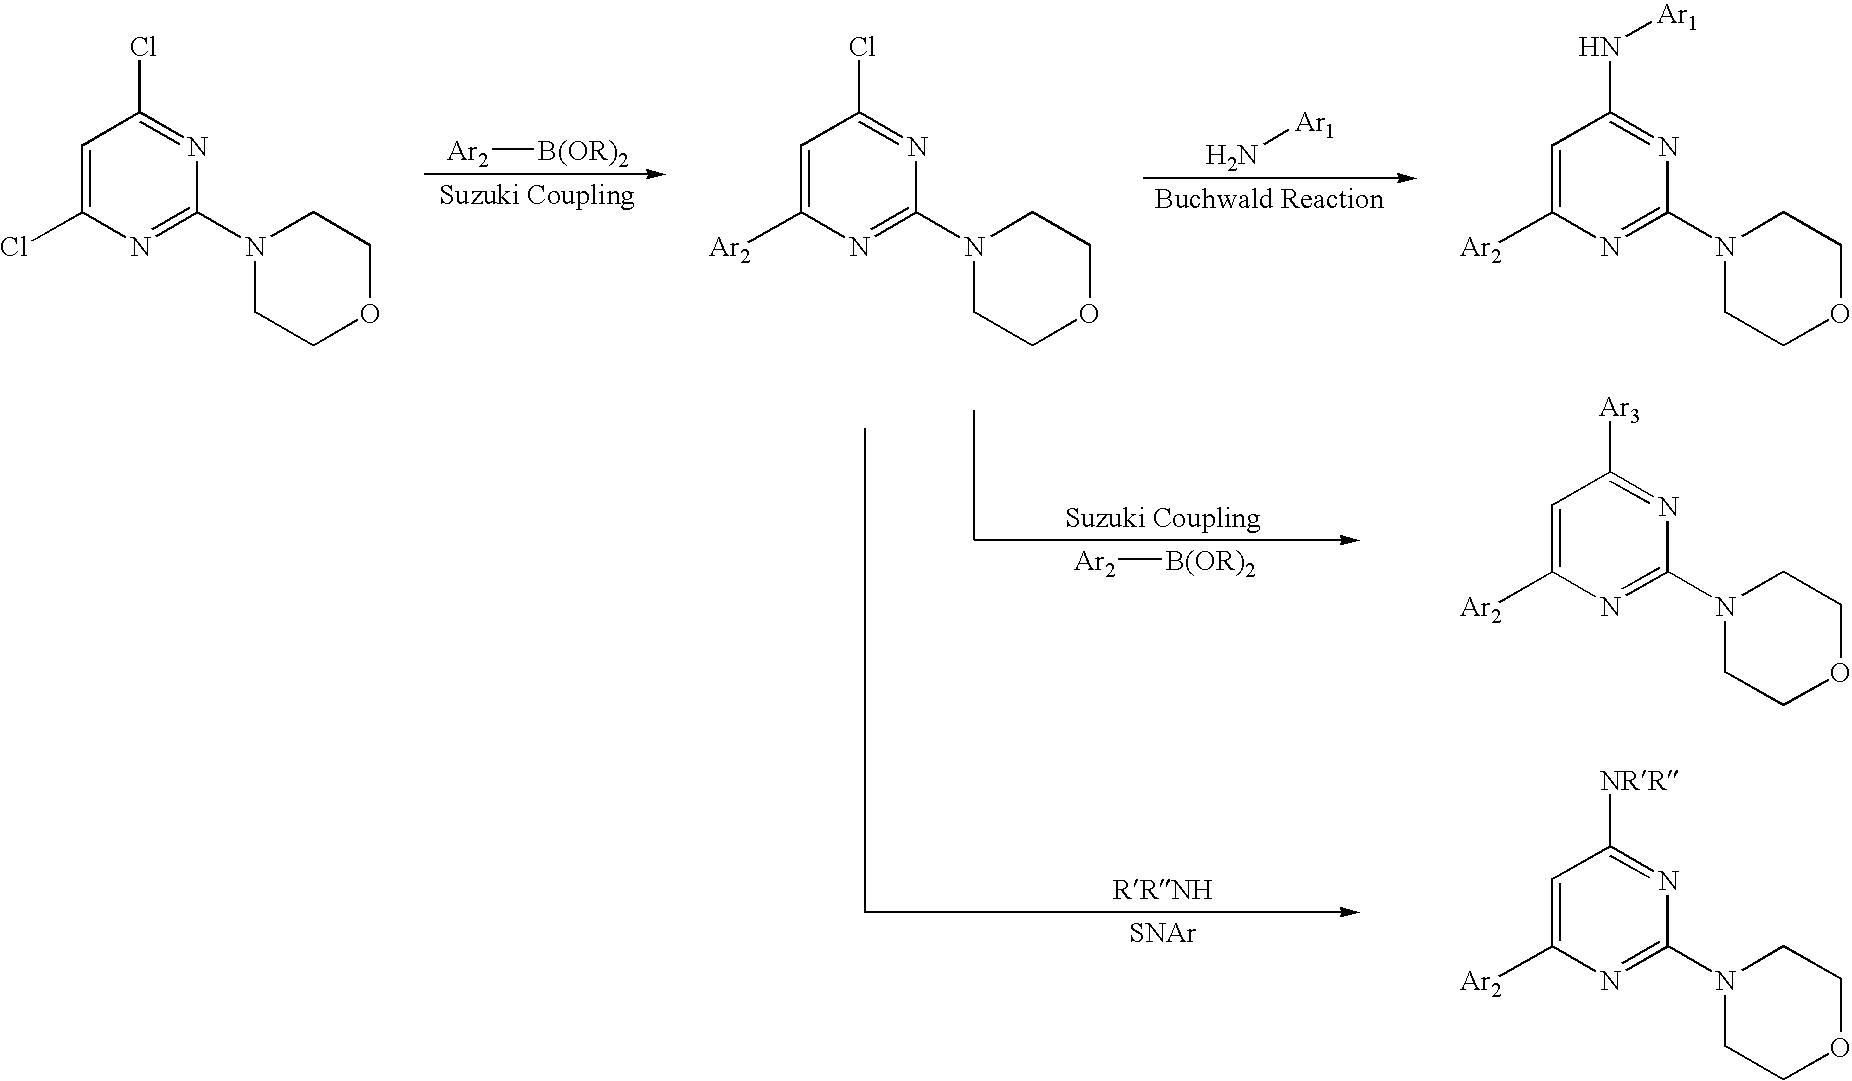 US20100249126A1 - Pyrimidine derivatives used as pi-3-kinase